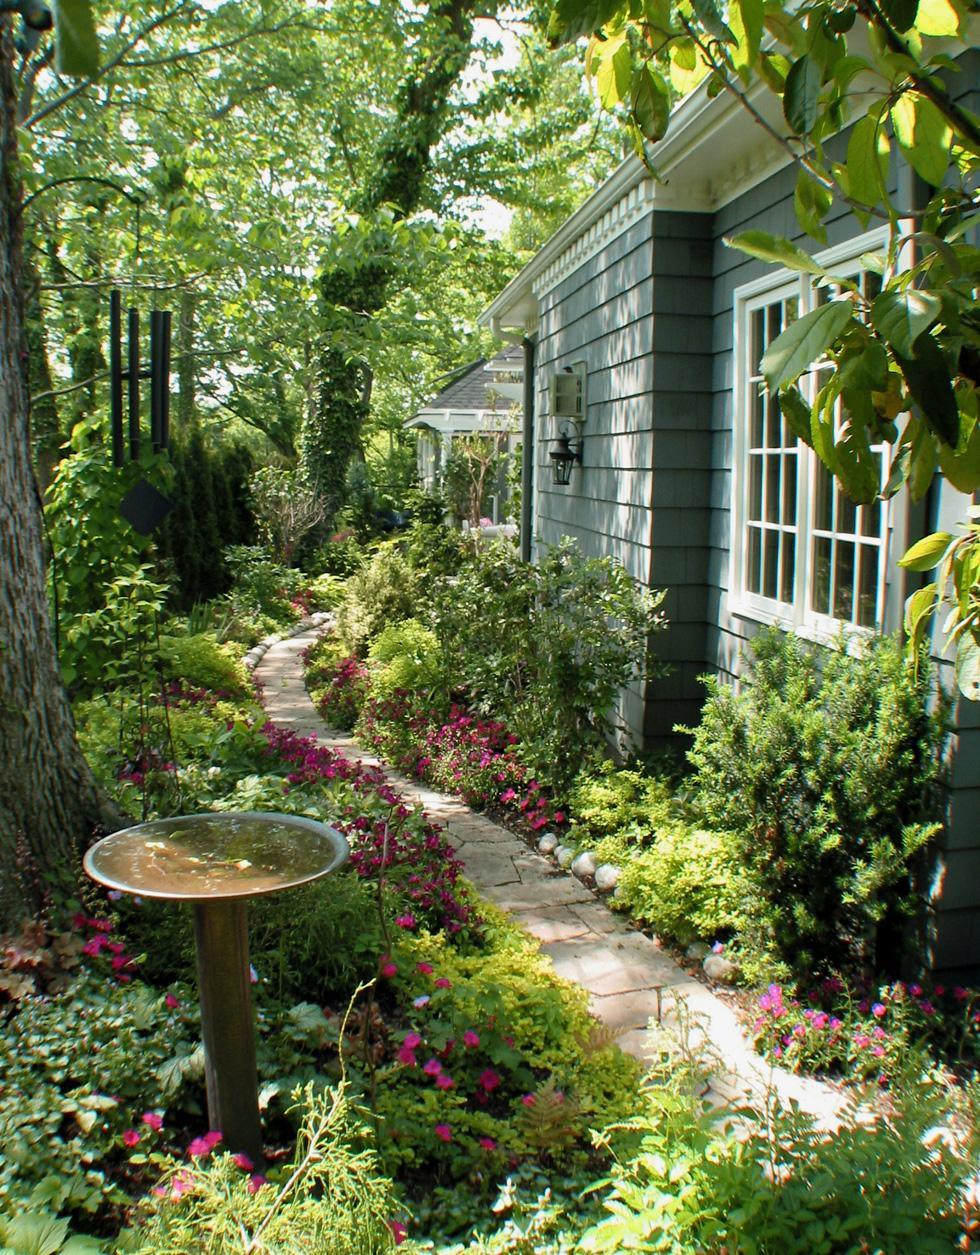 Native habitat in a back yard with bird bath